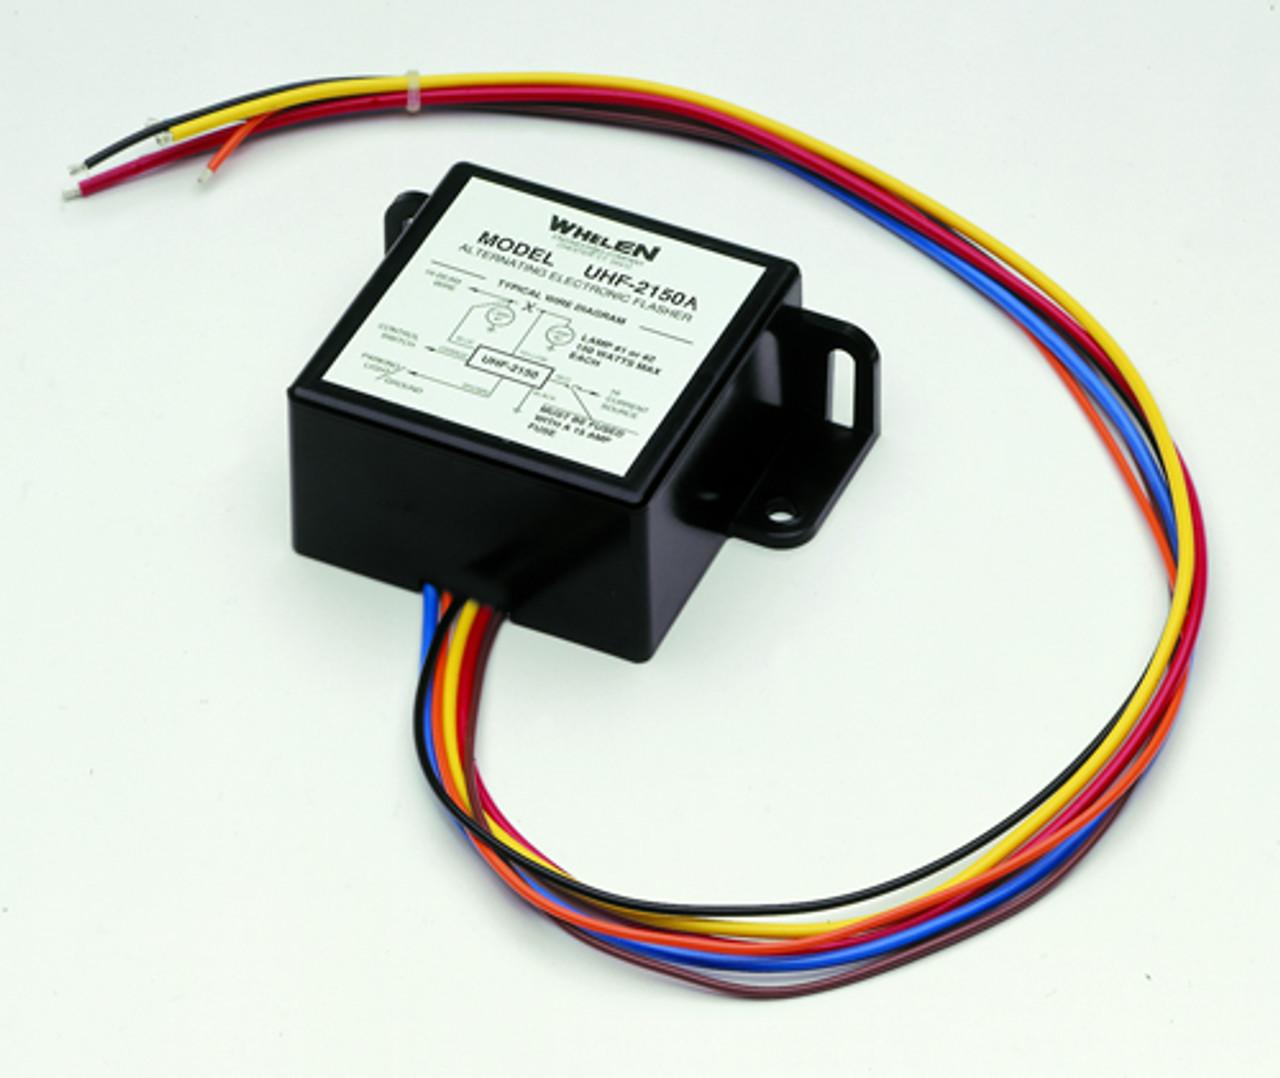 whelen power supply wiring diagram universal headlight flasher by whelen uhf2150a  headlight flasher by whelen uhf2150a